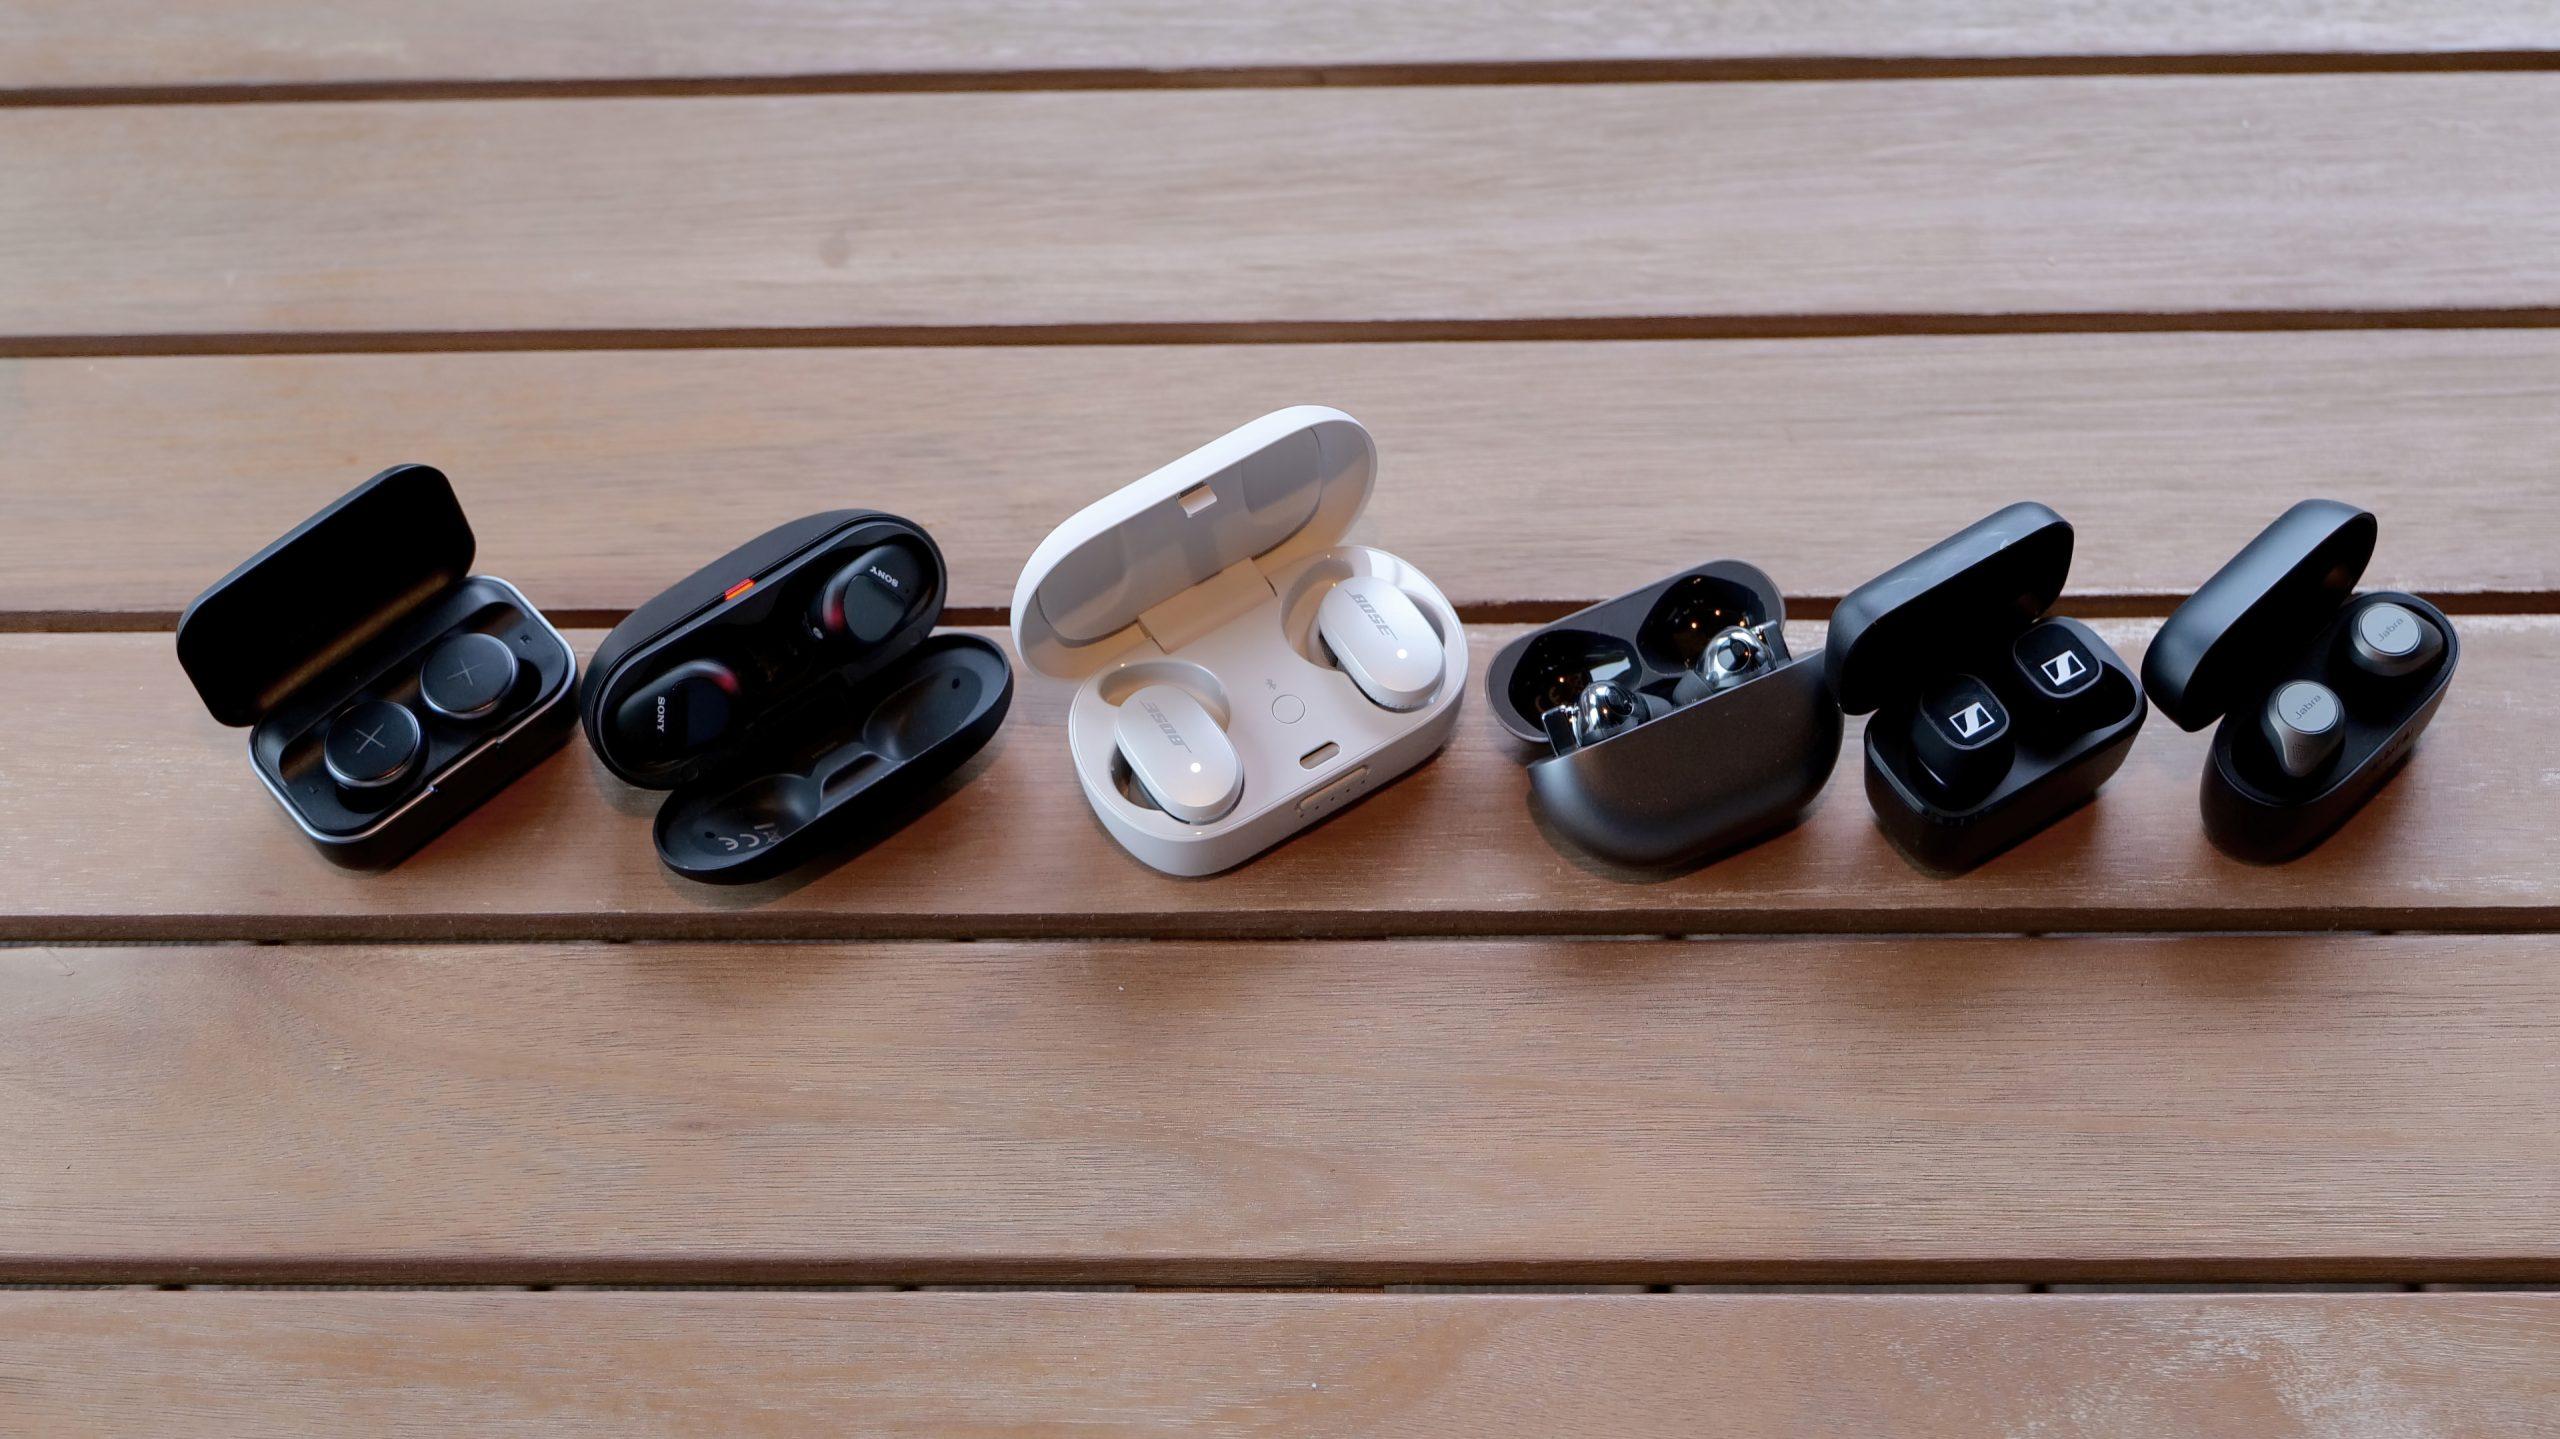 True wireless ørepropper. Fra venstre til høyre: X by Kygo Xellence, Sony WF-SP800N, Bose QuietComfort Earbuds, Huawei Freebuds Pro, Sennheiser CX 400BT, Jabra Elite 85t. Foto: Geir Gråbein Nordby